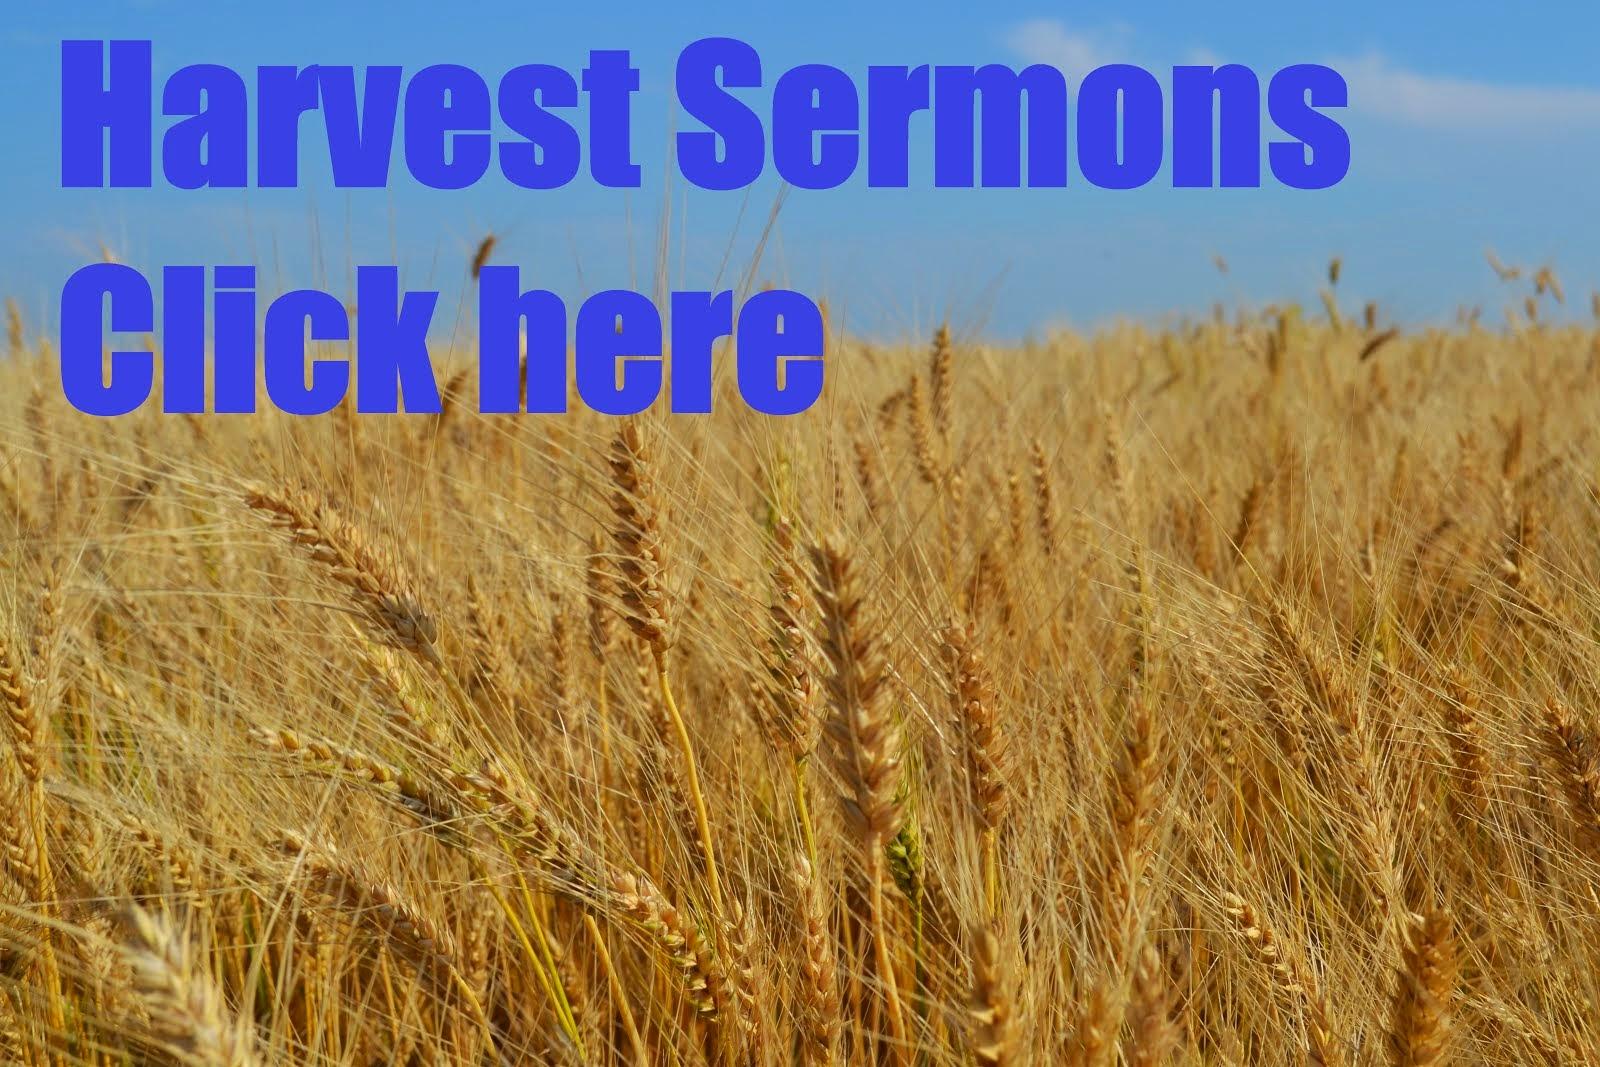 Harvest Sermons